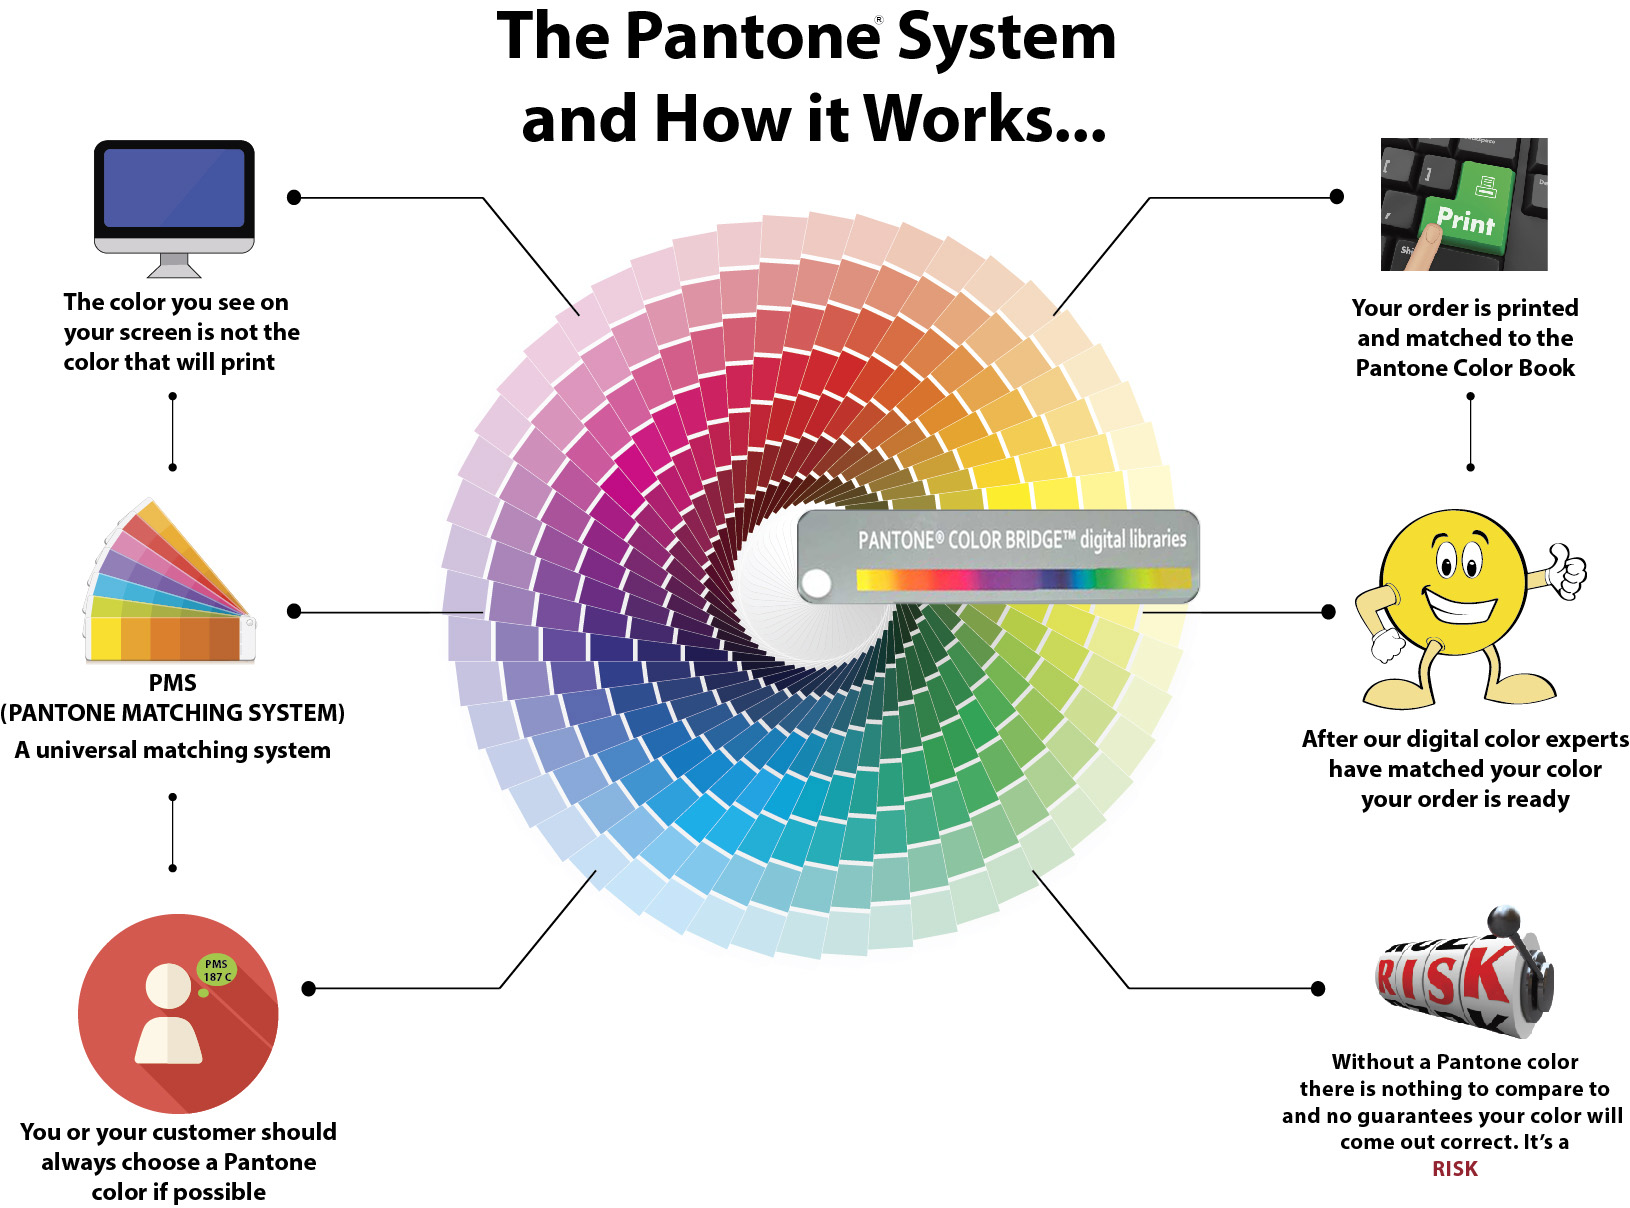 pantone-info-image.jpg